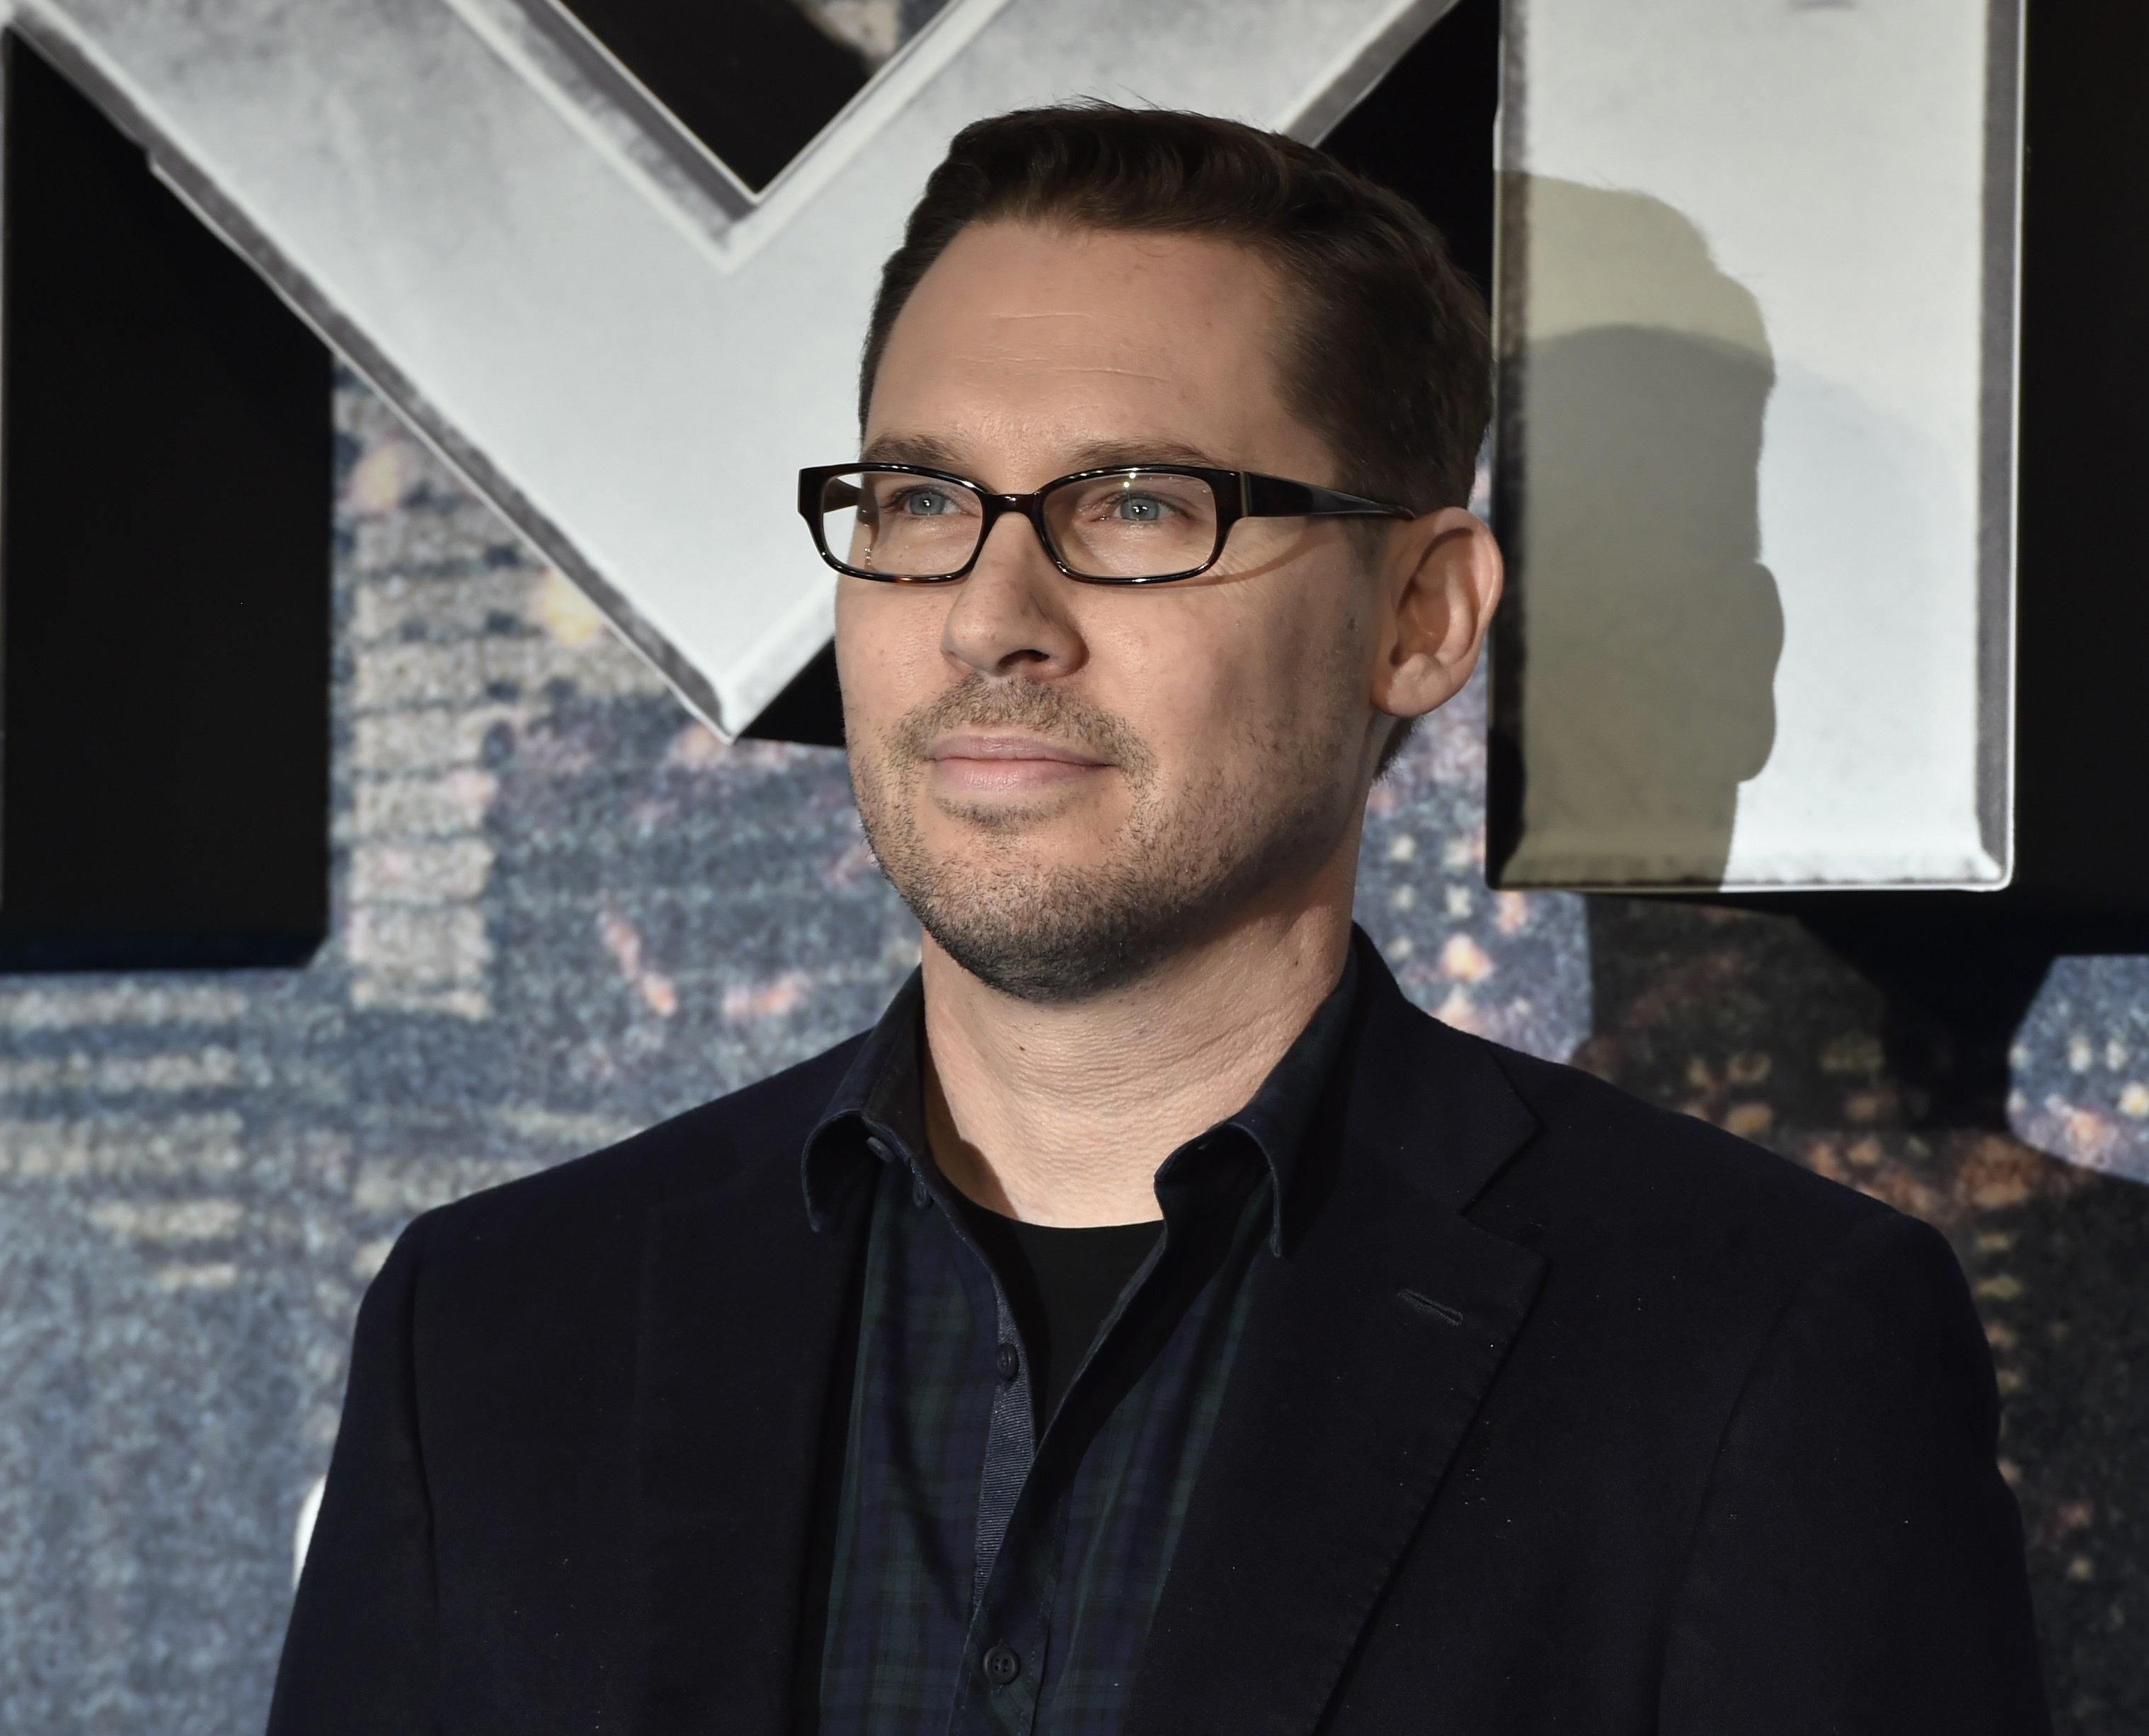 Director Bryan Singer arrives at a screening of X-Men Apocalypse at a cinema in London, Britain, May 9, 2016. REUTERS/Hannah McKay